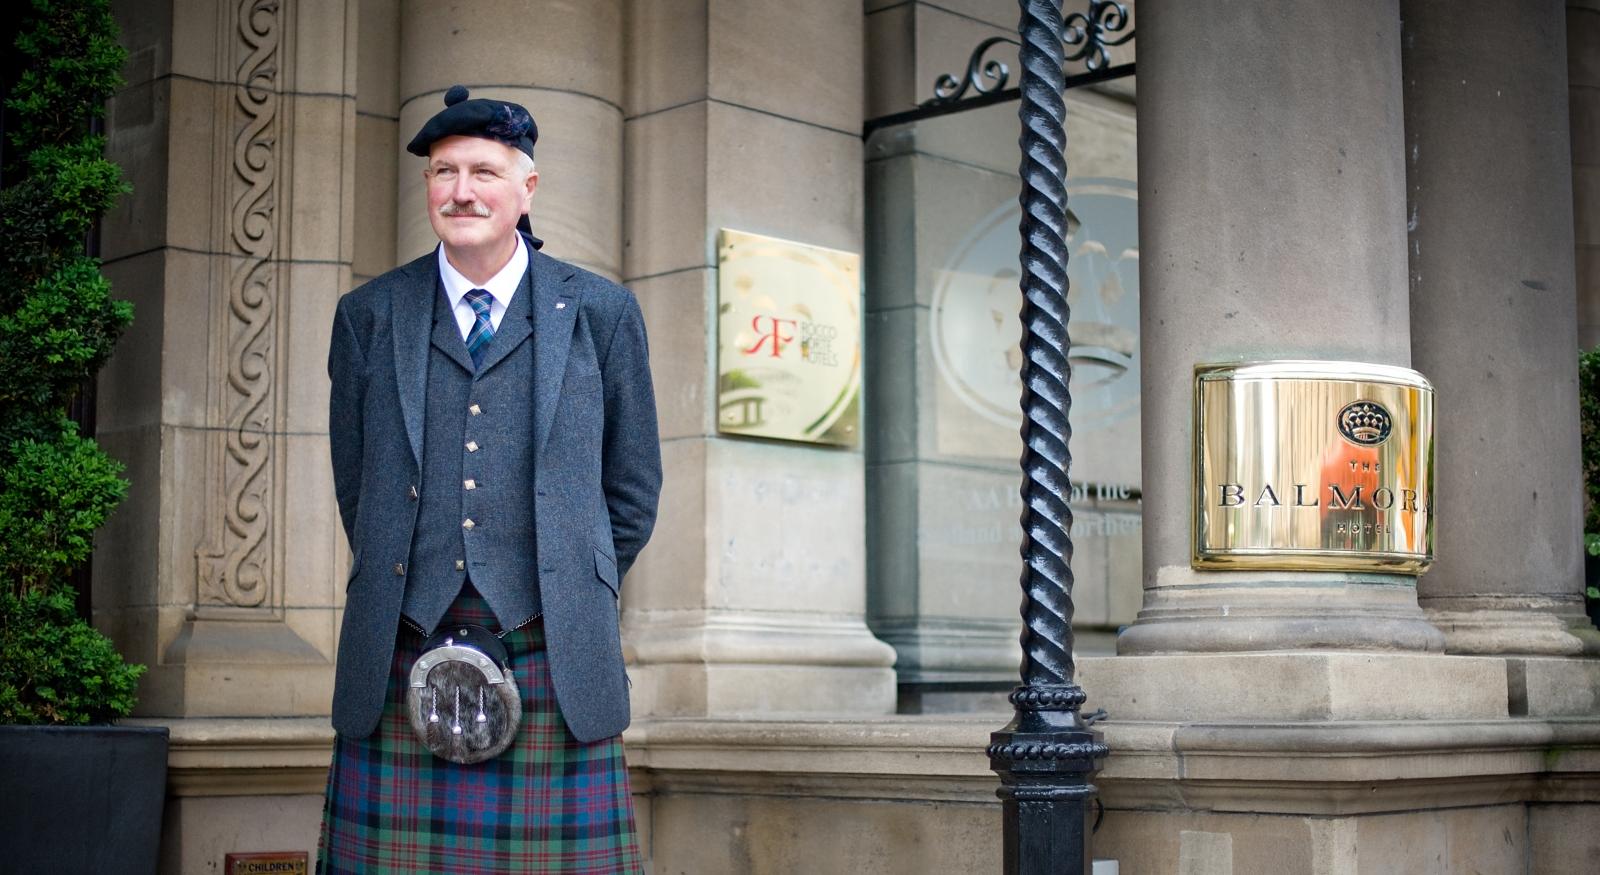 Welcome to The Balmoral Hotel, Edinburgh